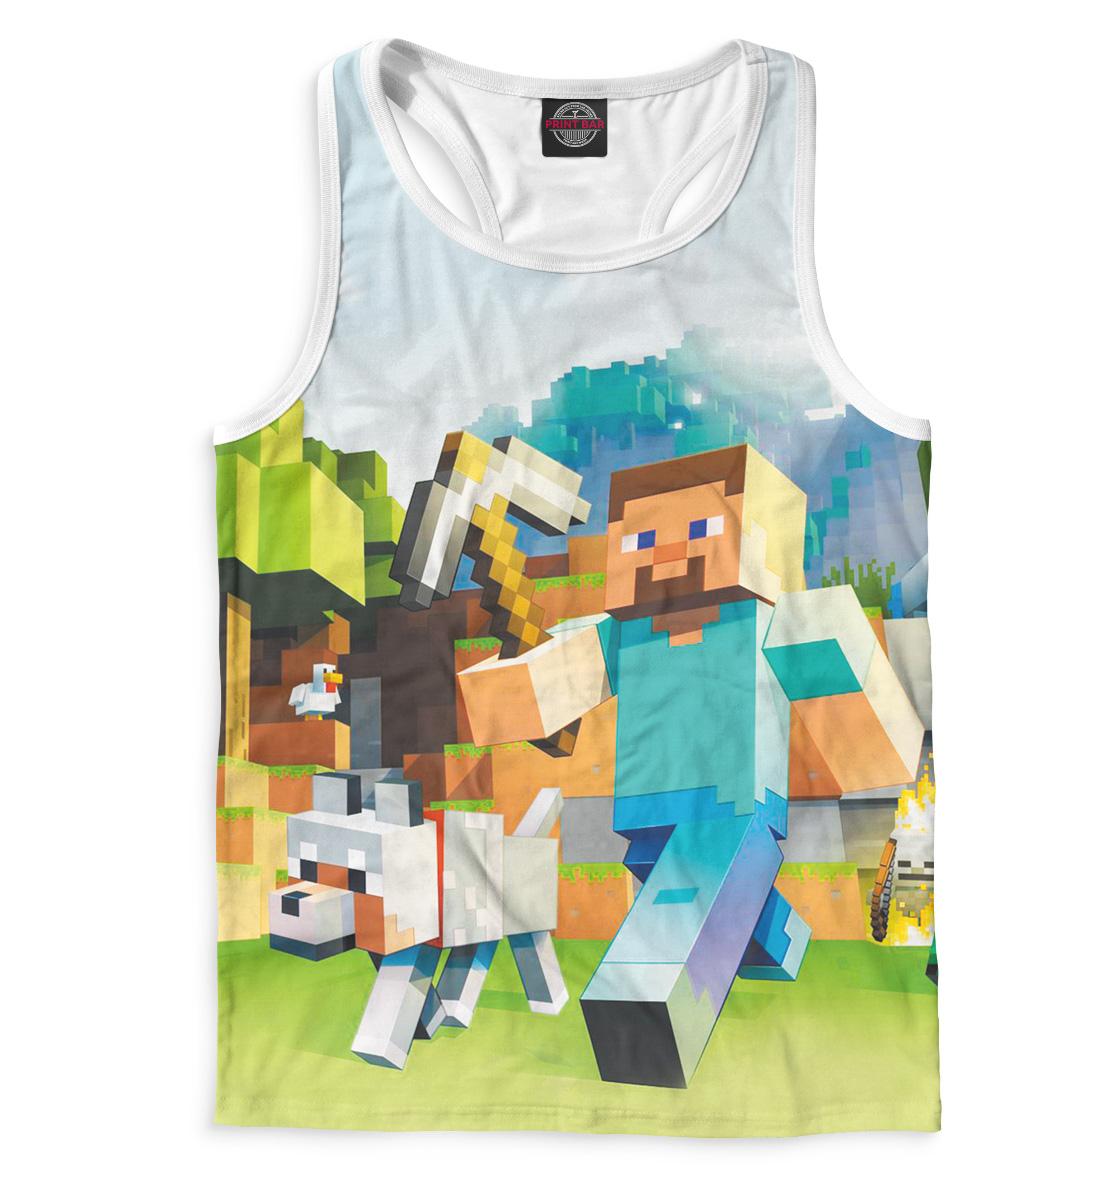 Купить Мужская майка-борцовка Minecraft MCR-593972-mayb-2